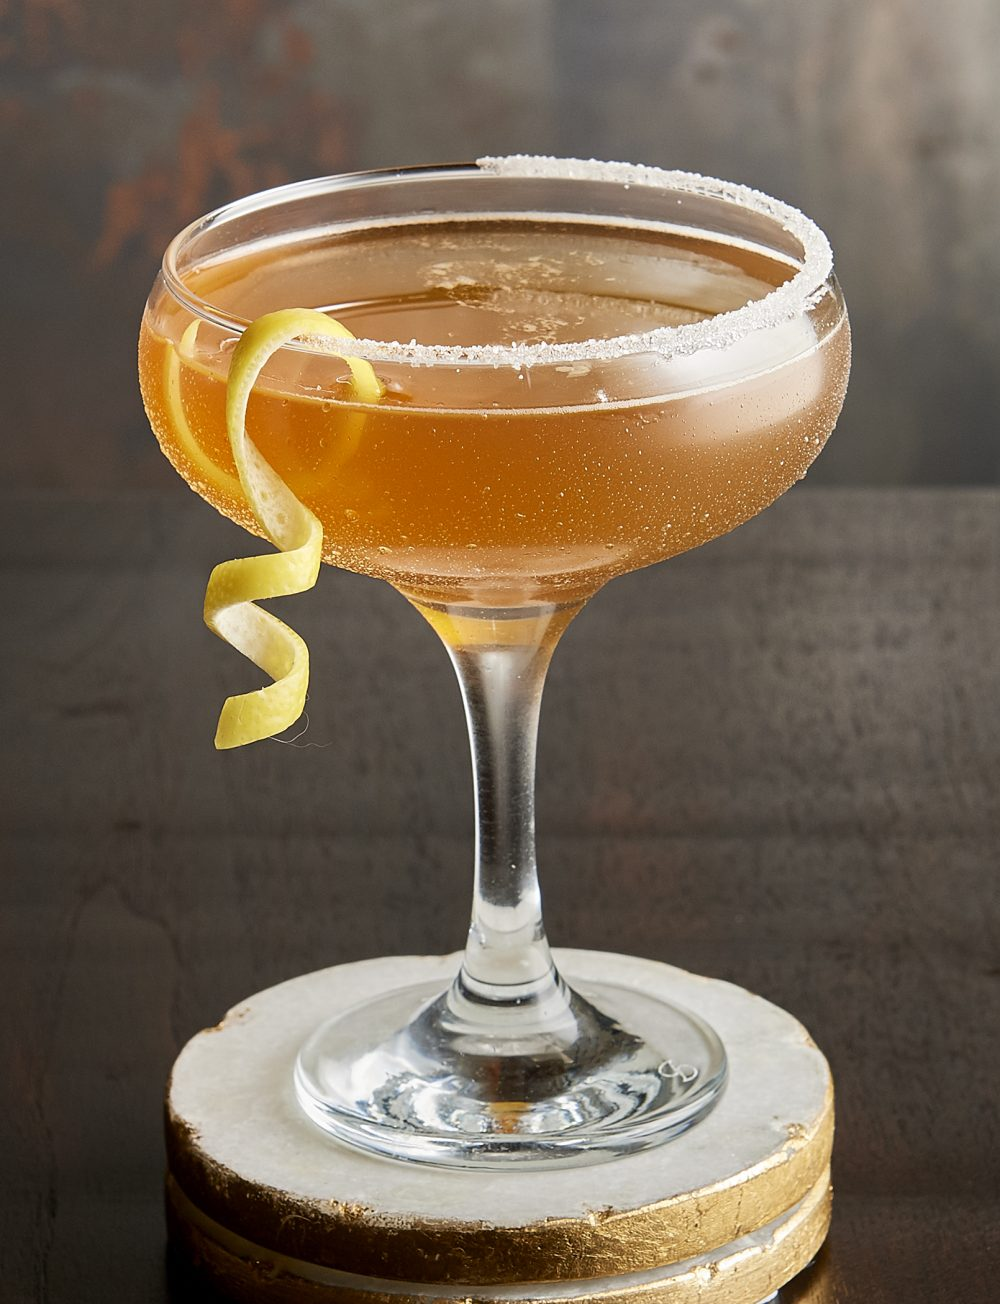 Iii Forks Cocktail